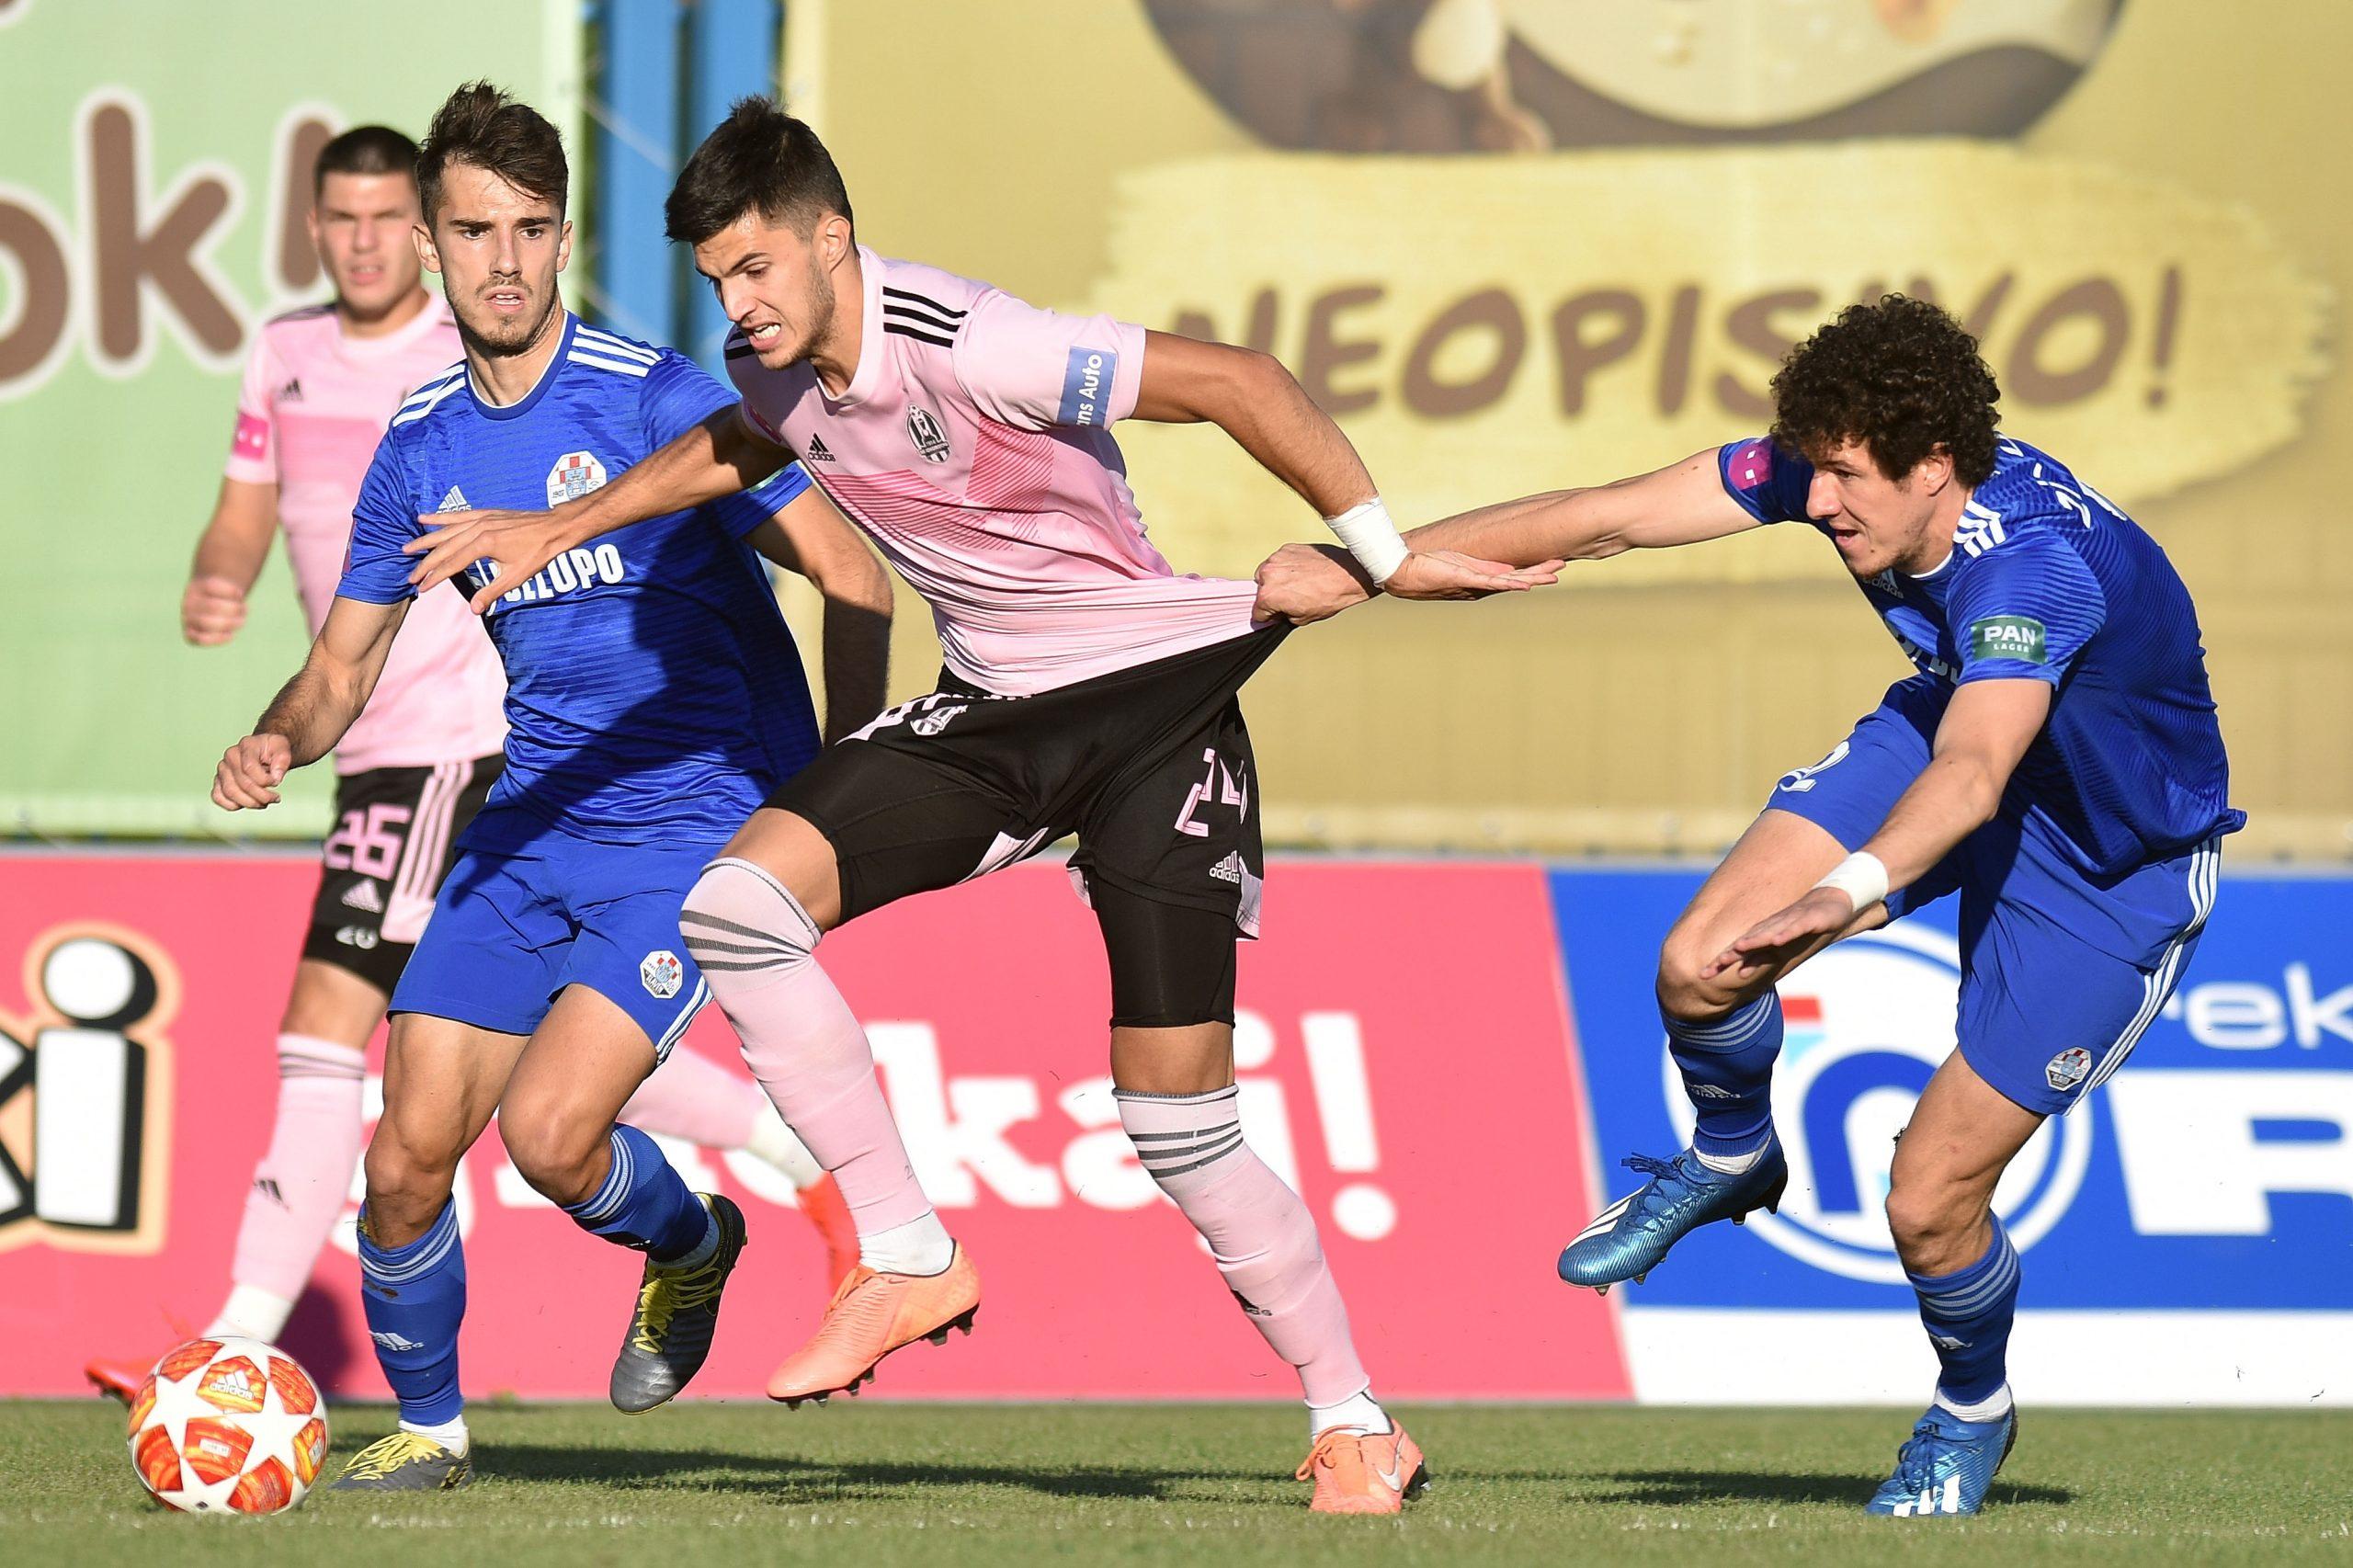 Detalj s utakmice u Koprivnici/Foto PIXSELL